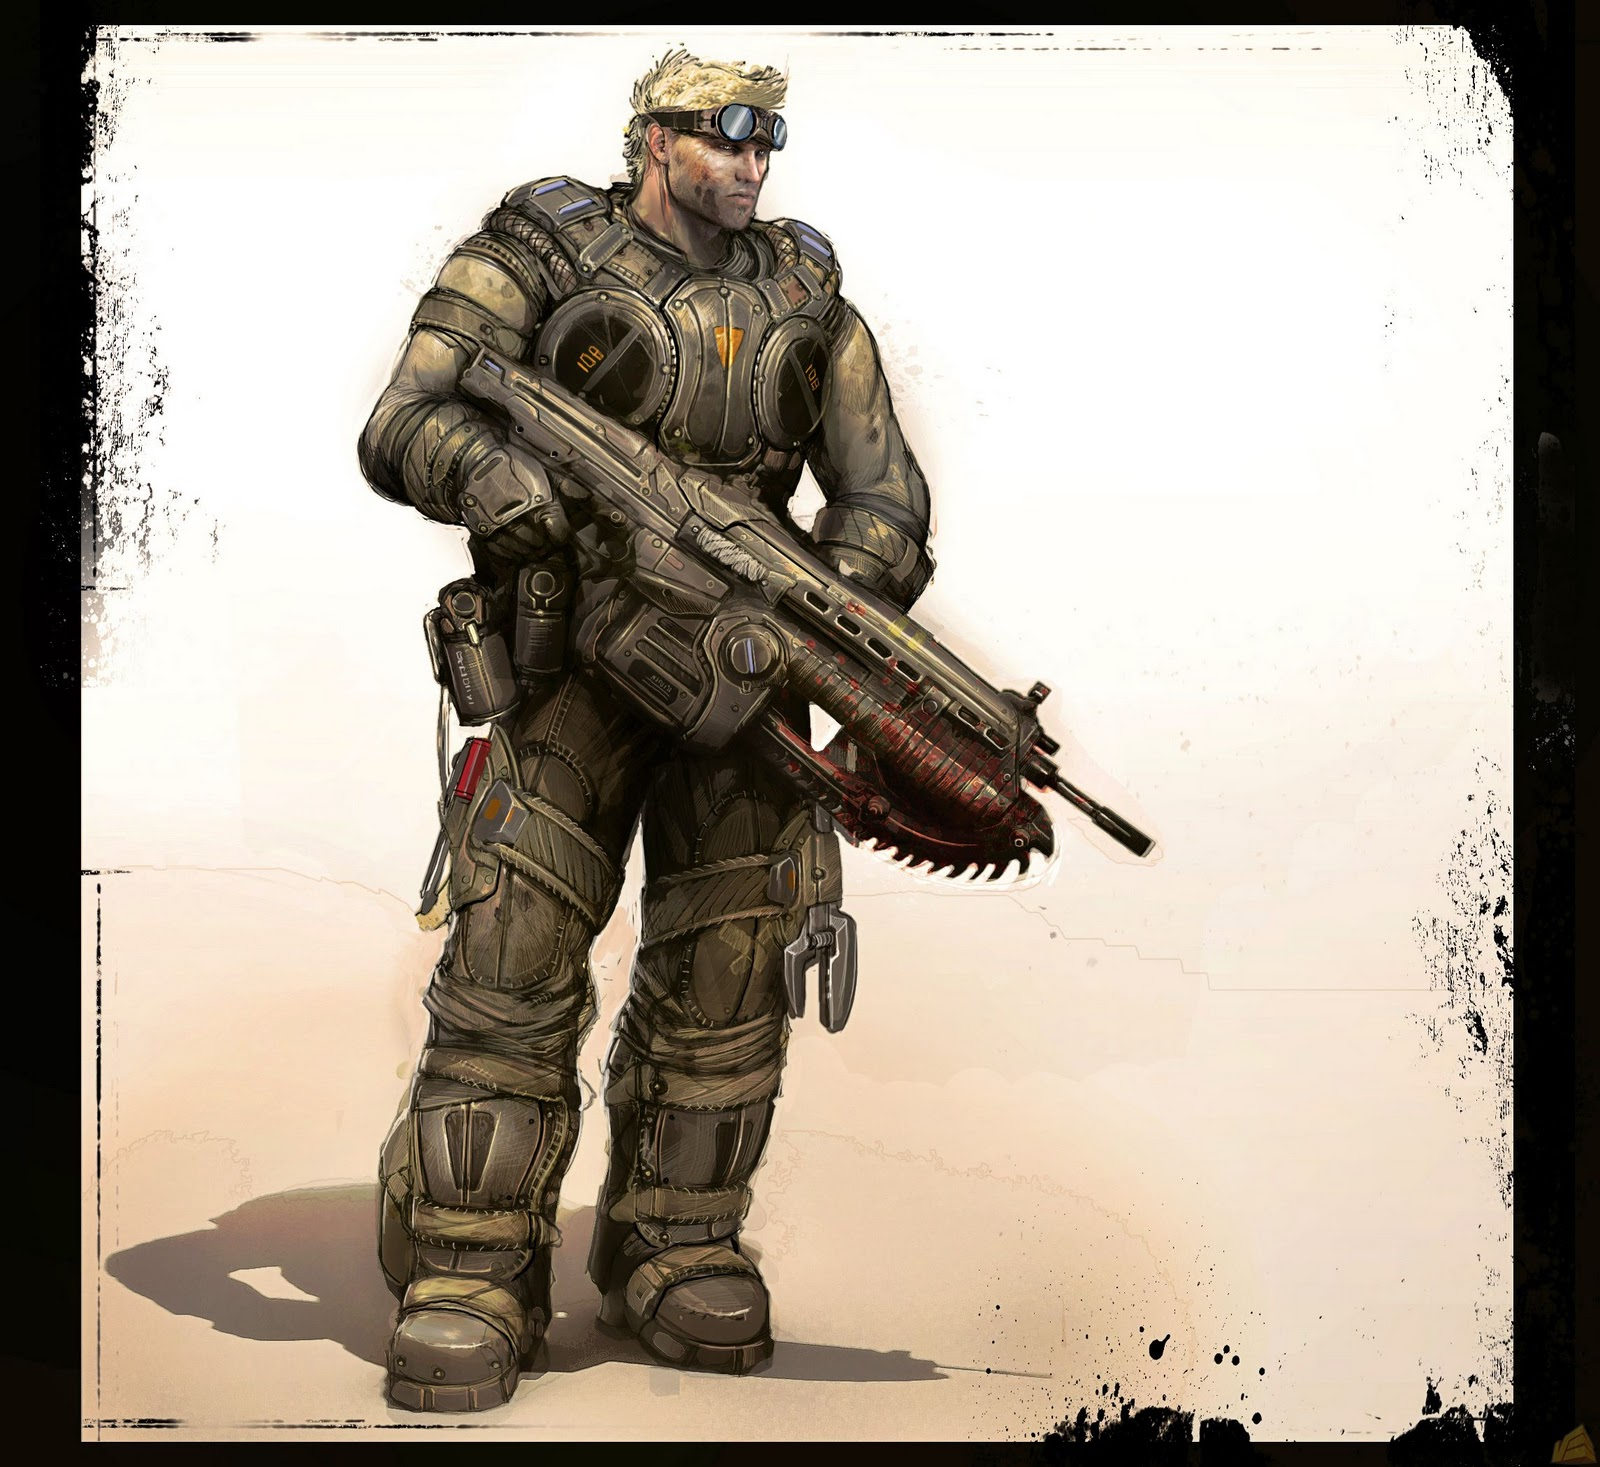 El Rincon Del Golem Desbloqueos Del Gears Of War 3